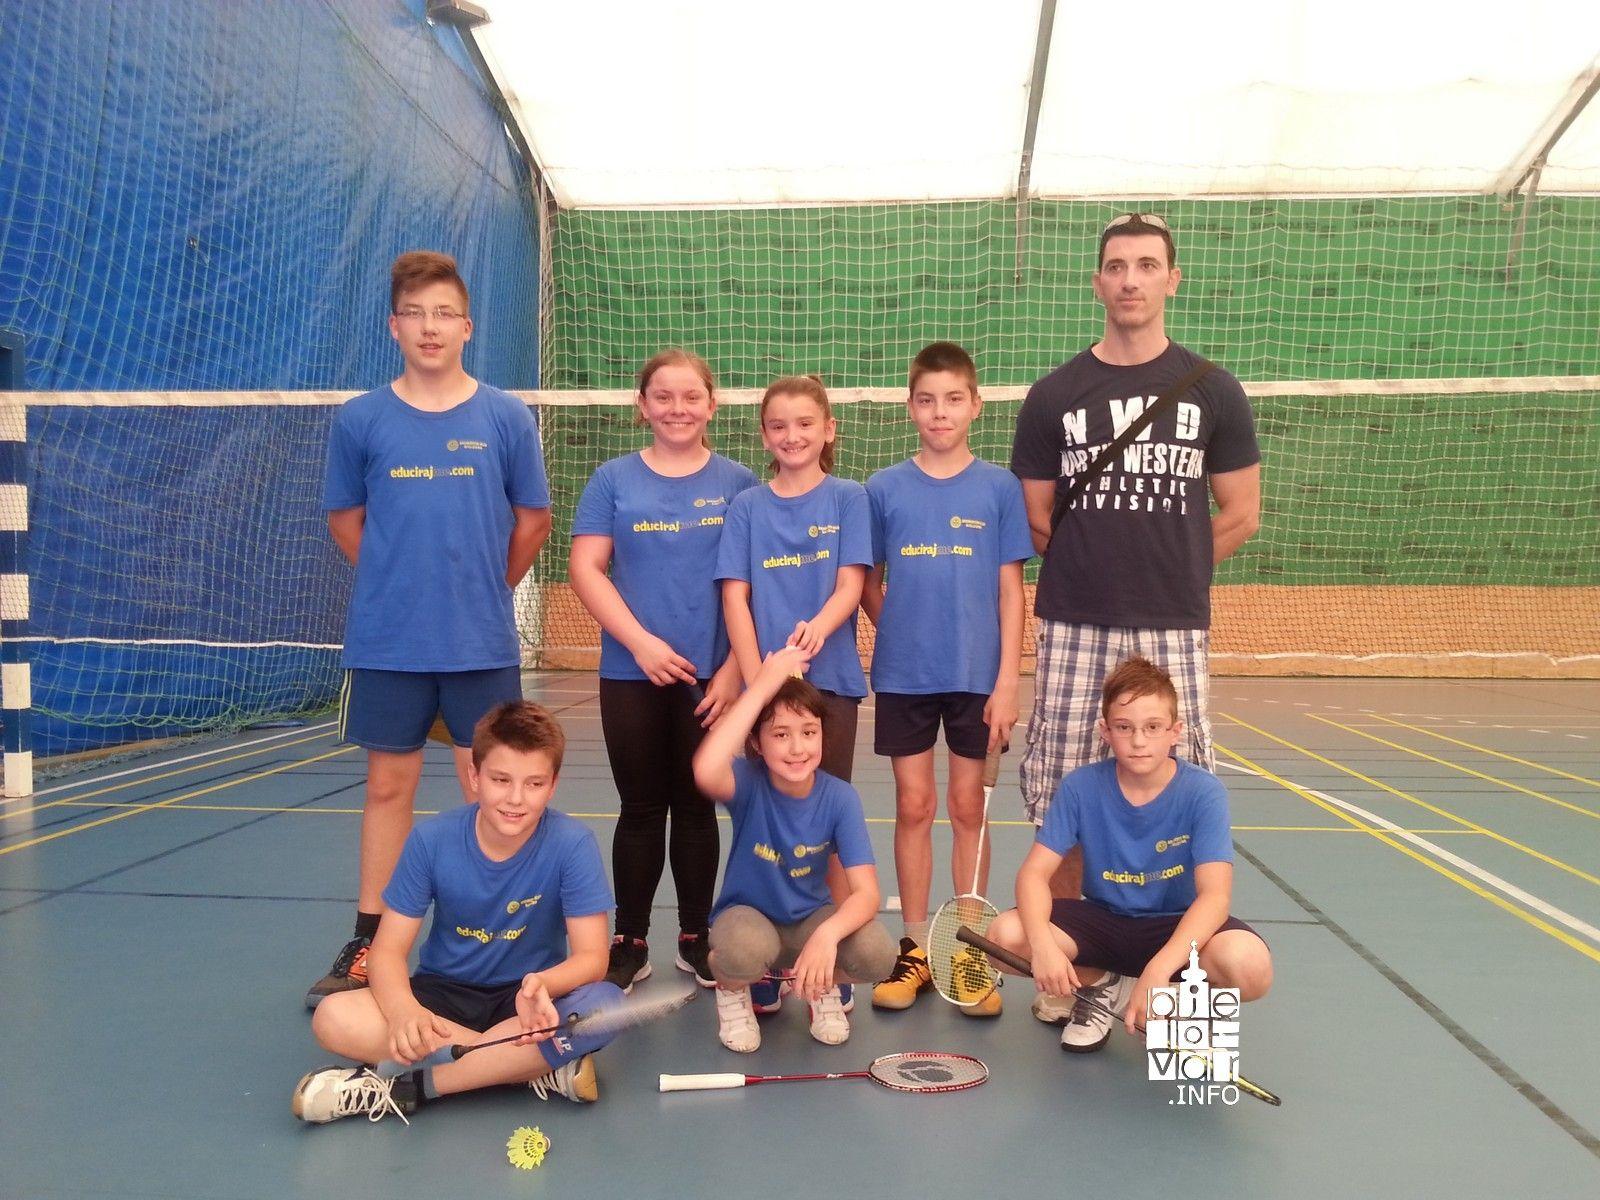 2016 06 badminton 1